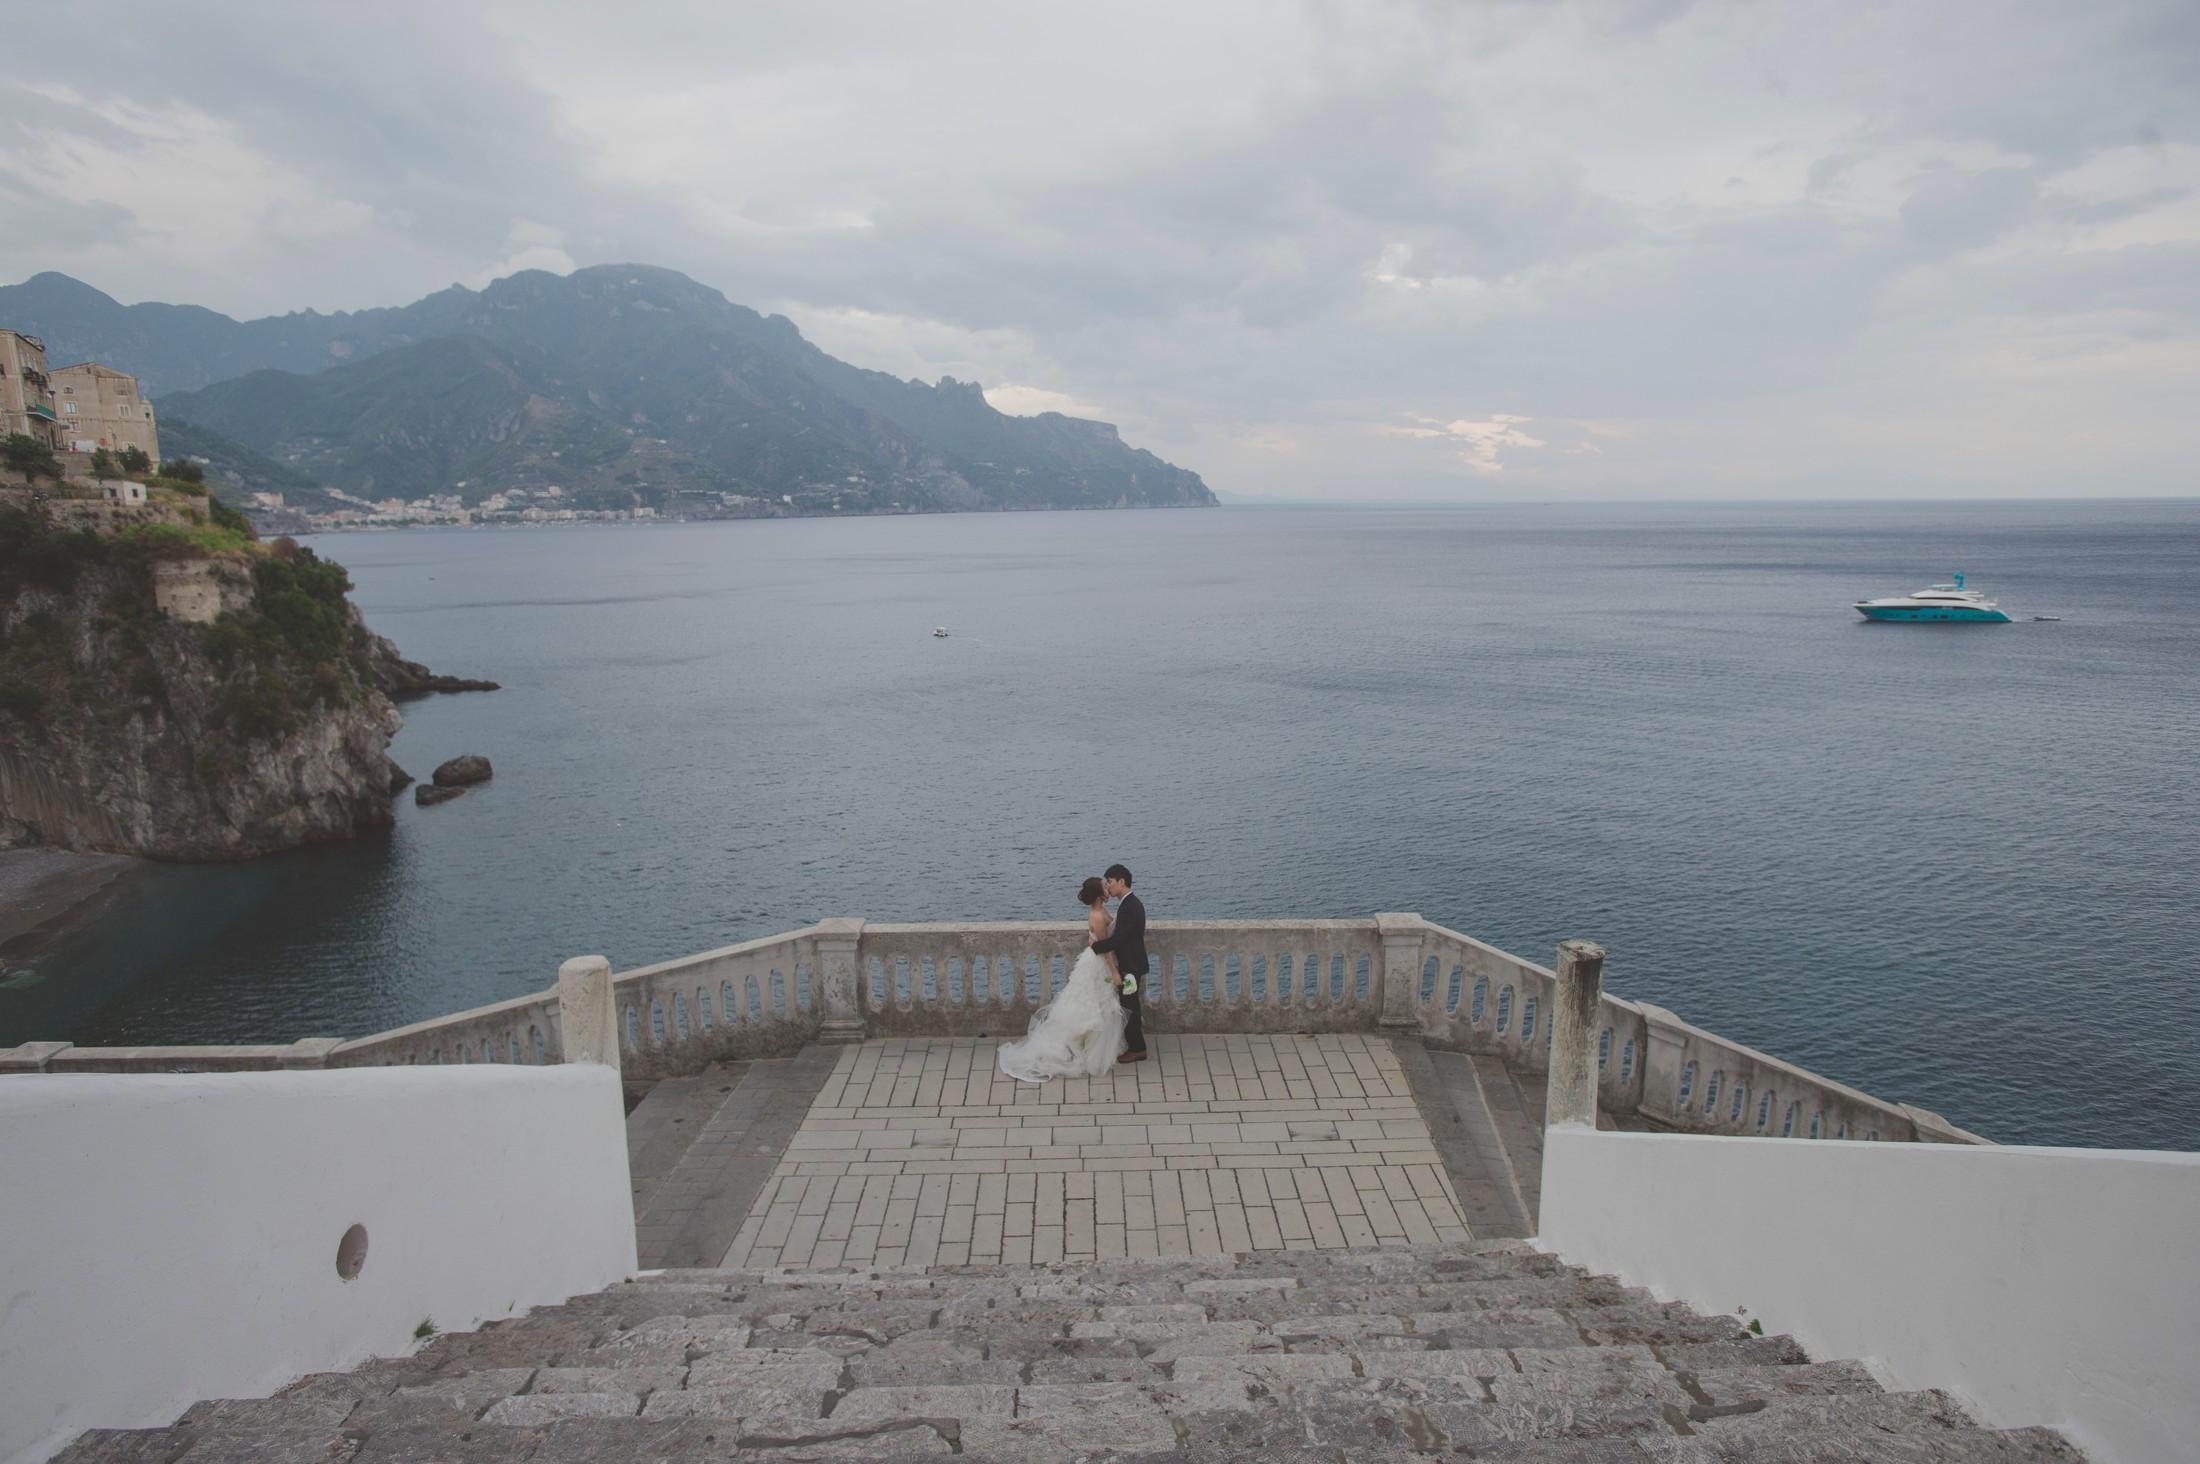 wedding on the amalfi coast bride and groom's portrait by the sea